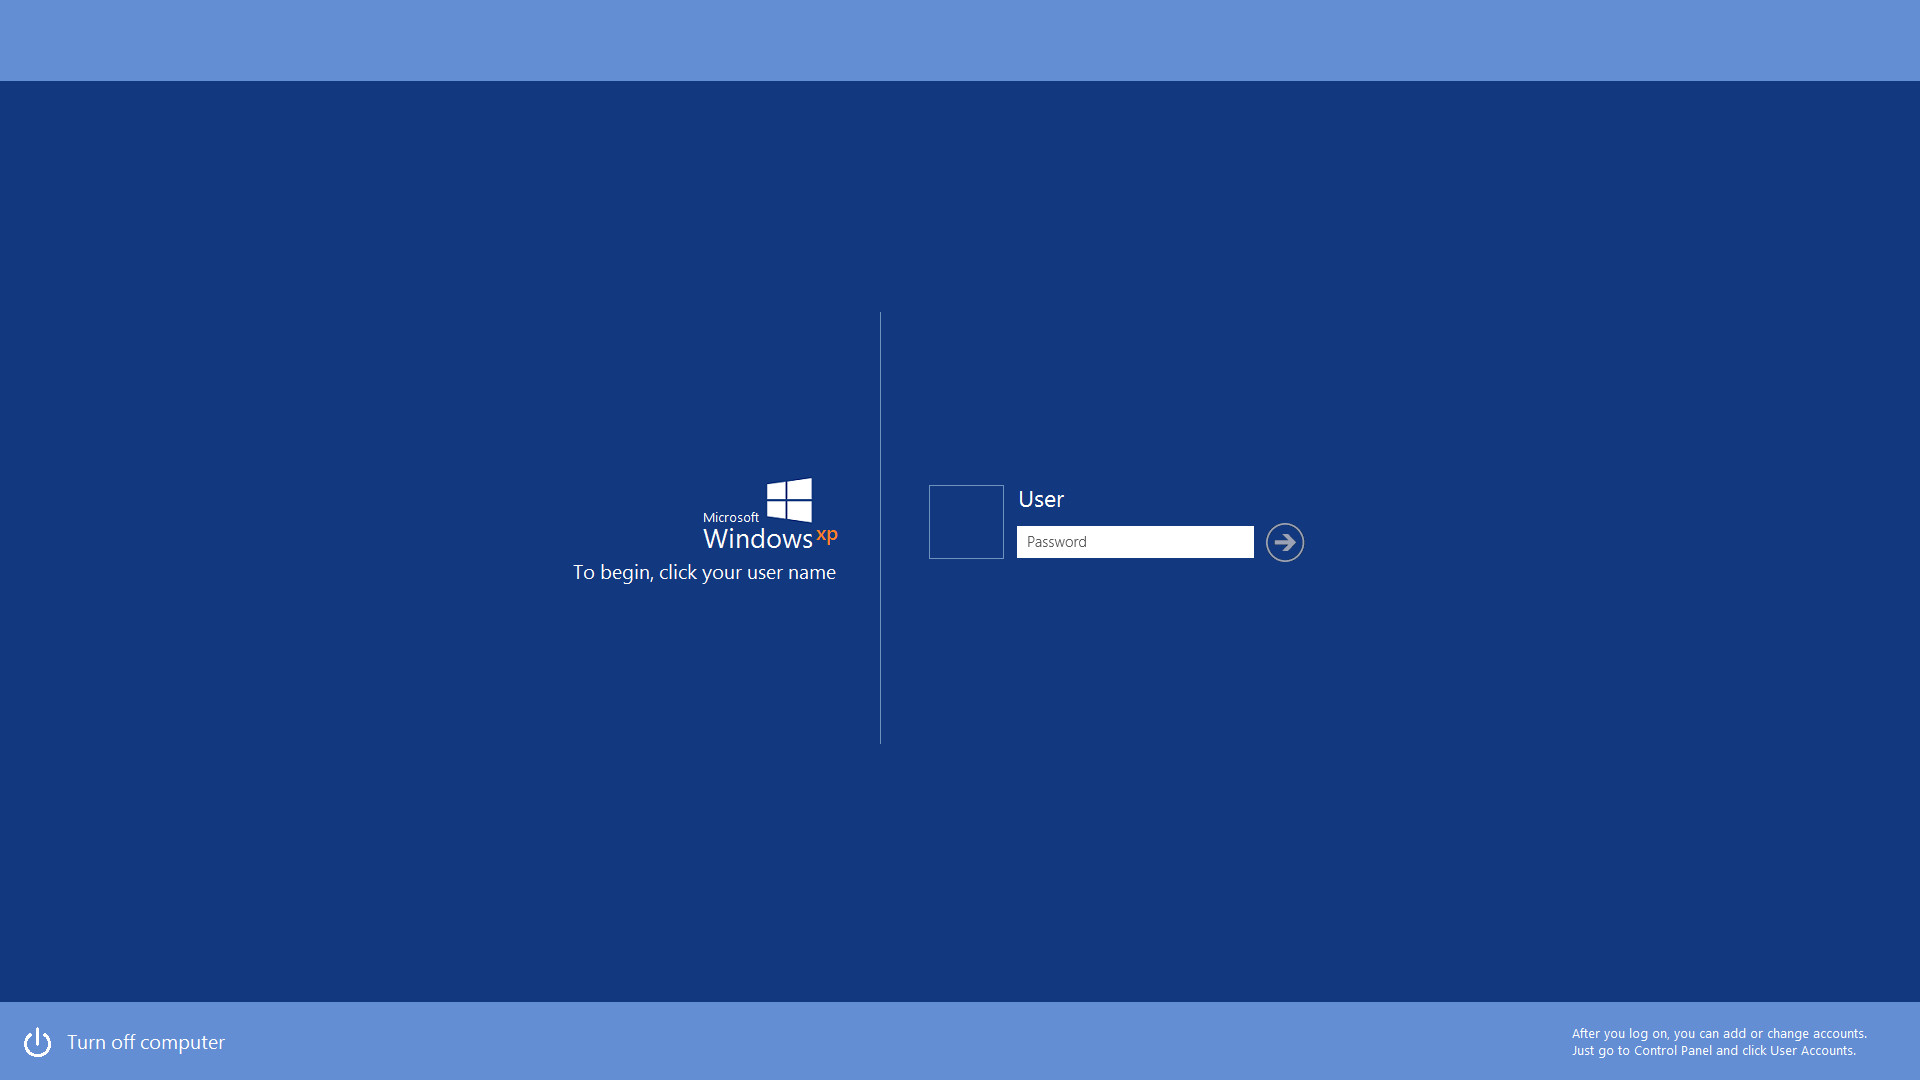 Windows XP Metro Logon Screen Concept by gifteddeviant on DeviantArt